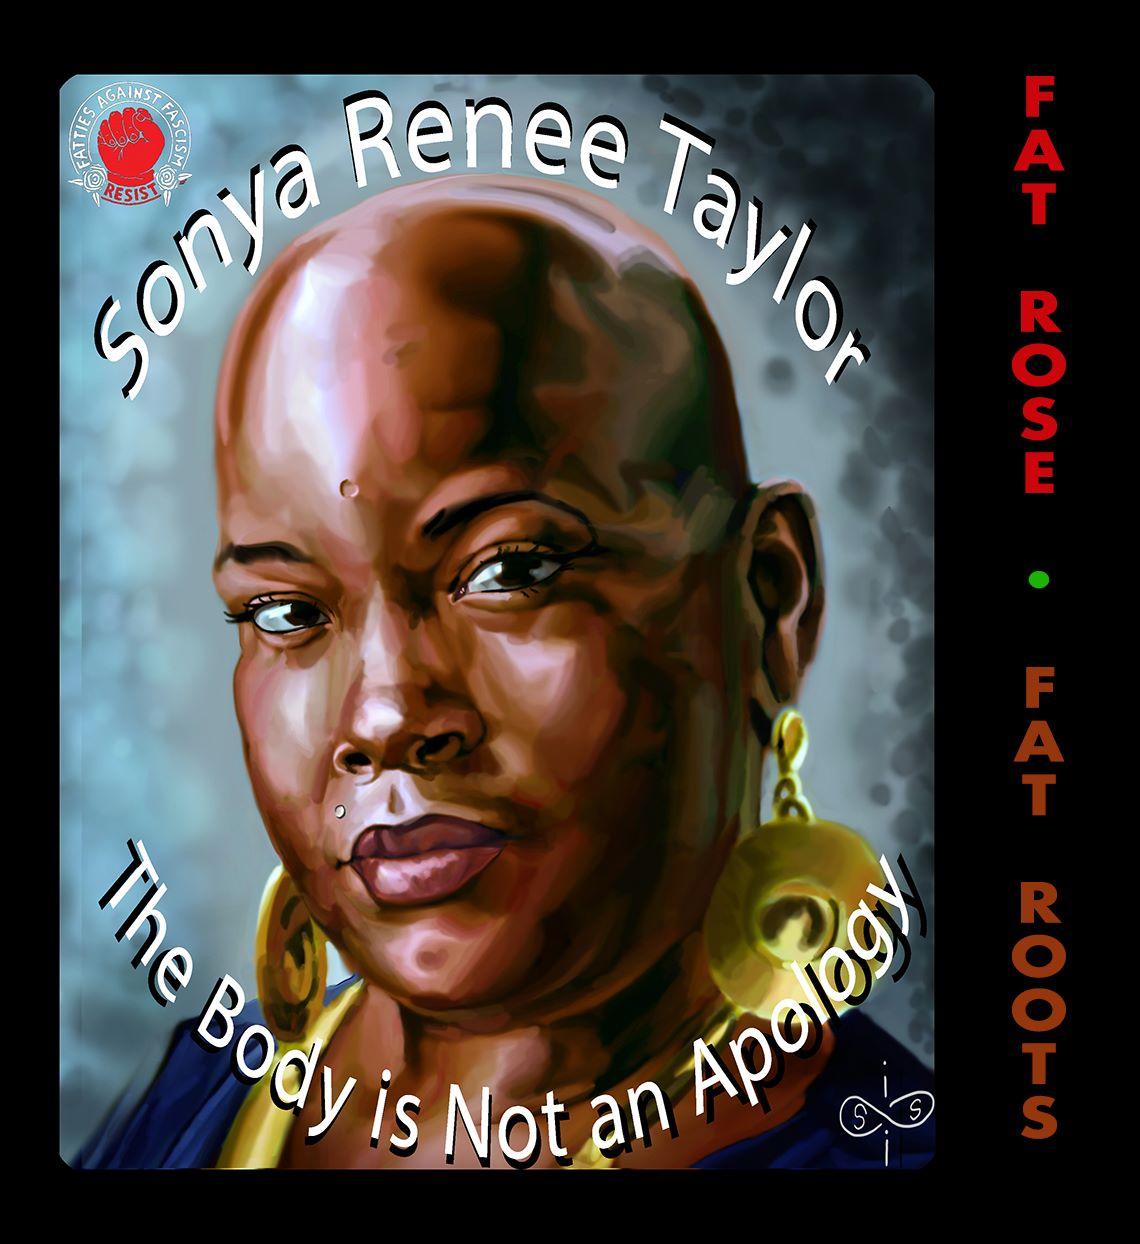 Fat Roots: Sonya Renee Taylor